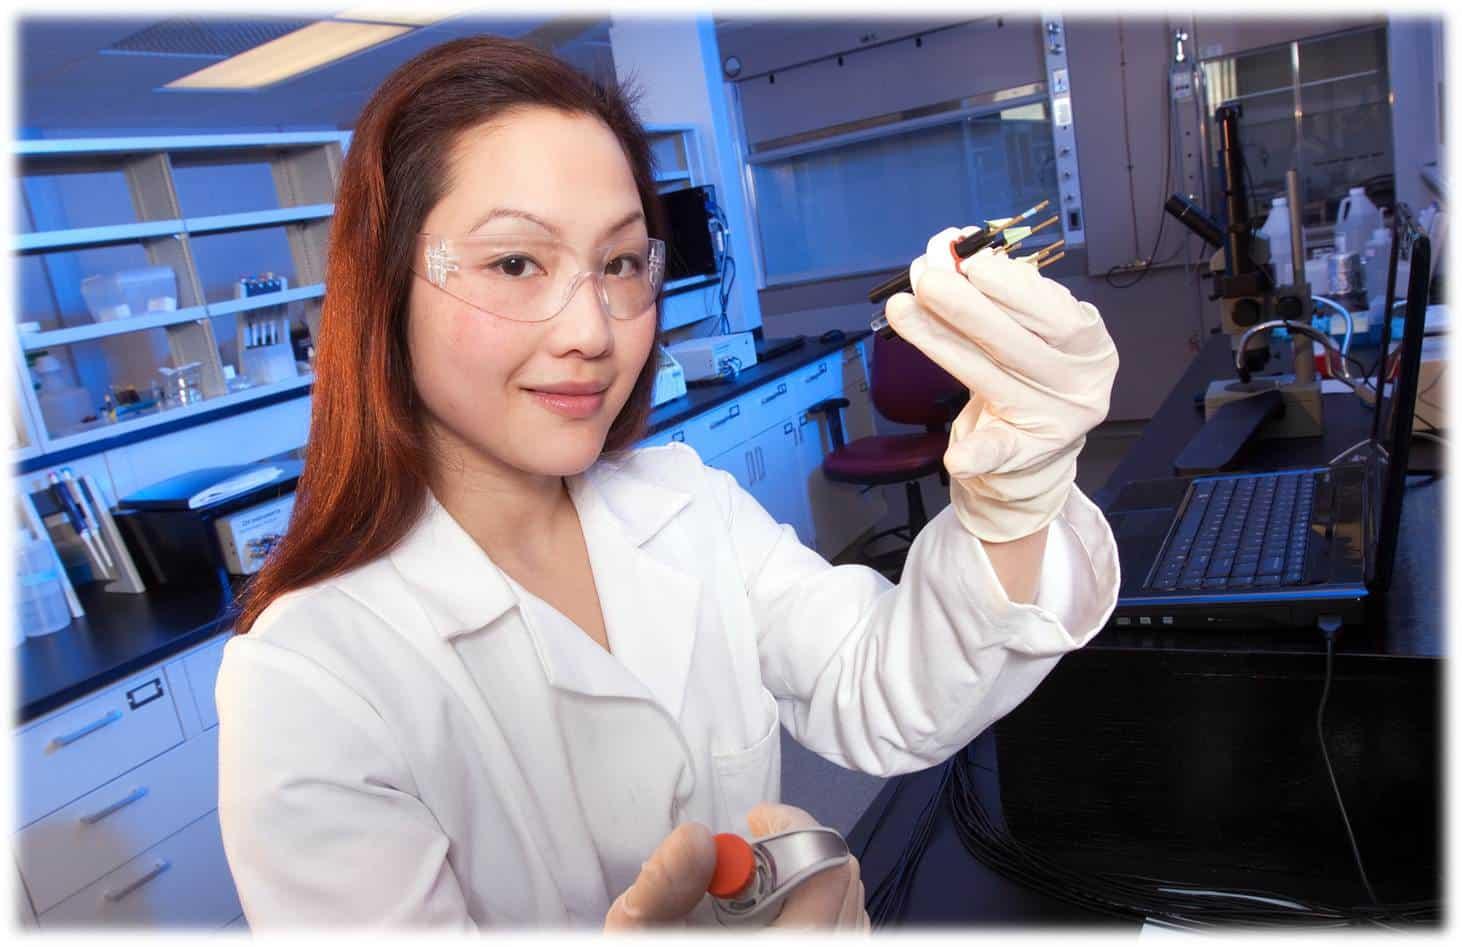 Freshers Chemistry Job @ Cadila Healthcare Limited